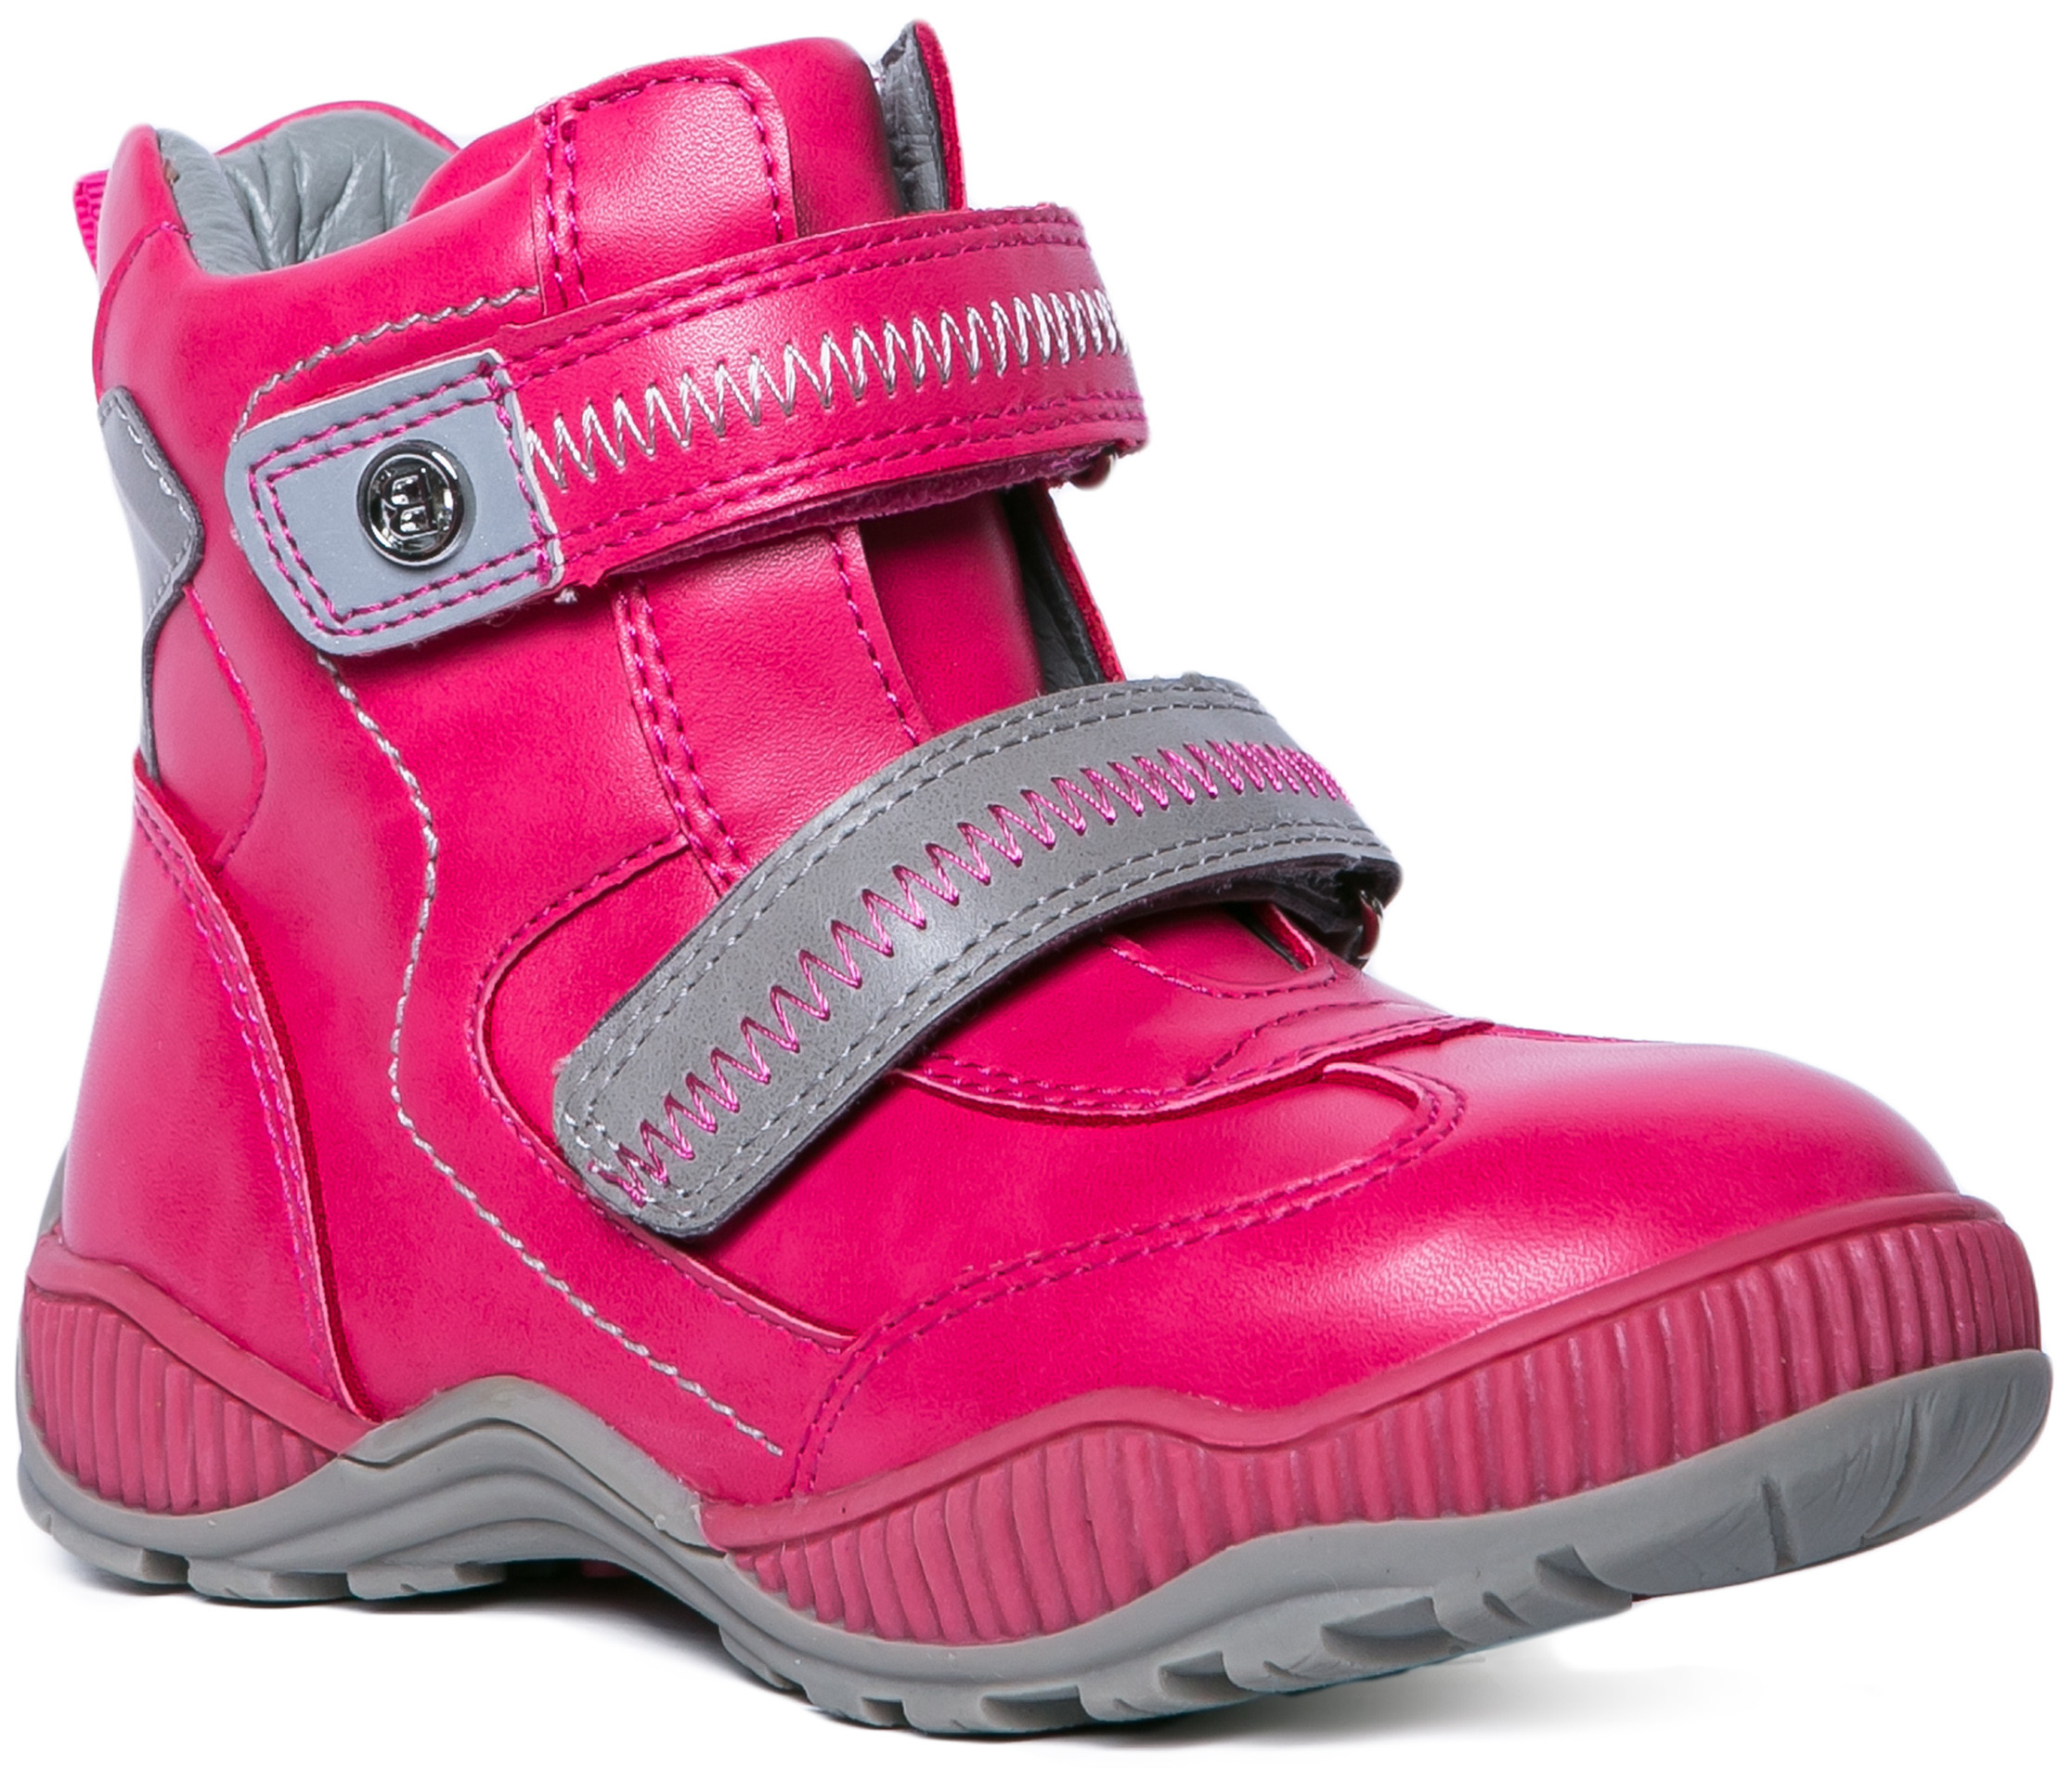 Ботинки и полуботинки Barkito Ботинки для девочки Barkito, фуксия ботинки longfield